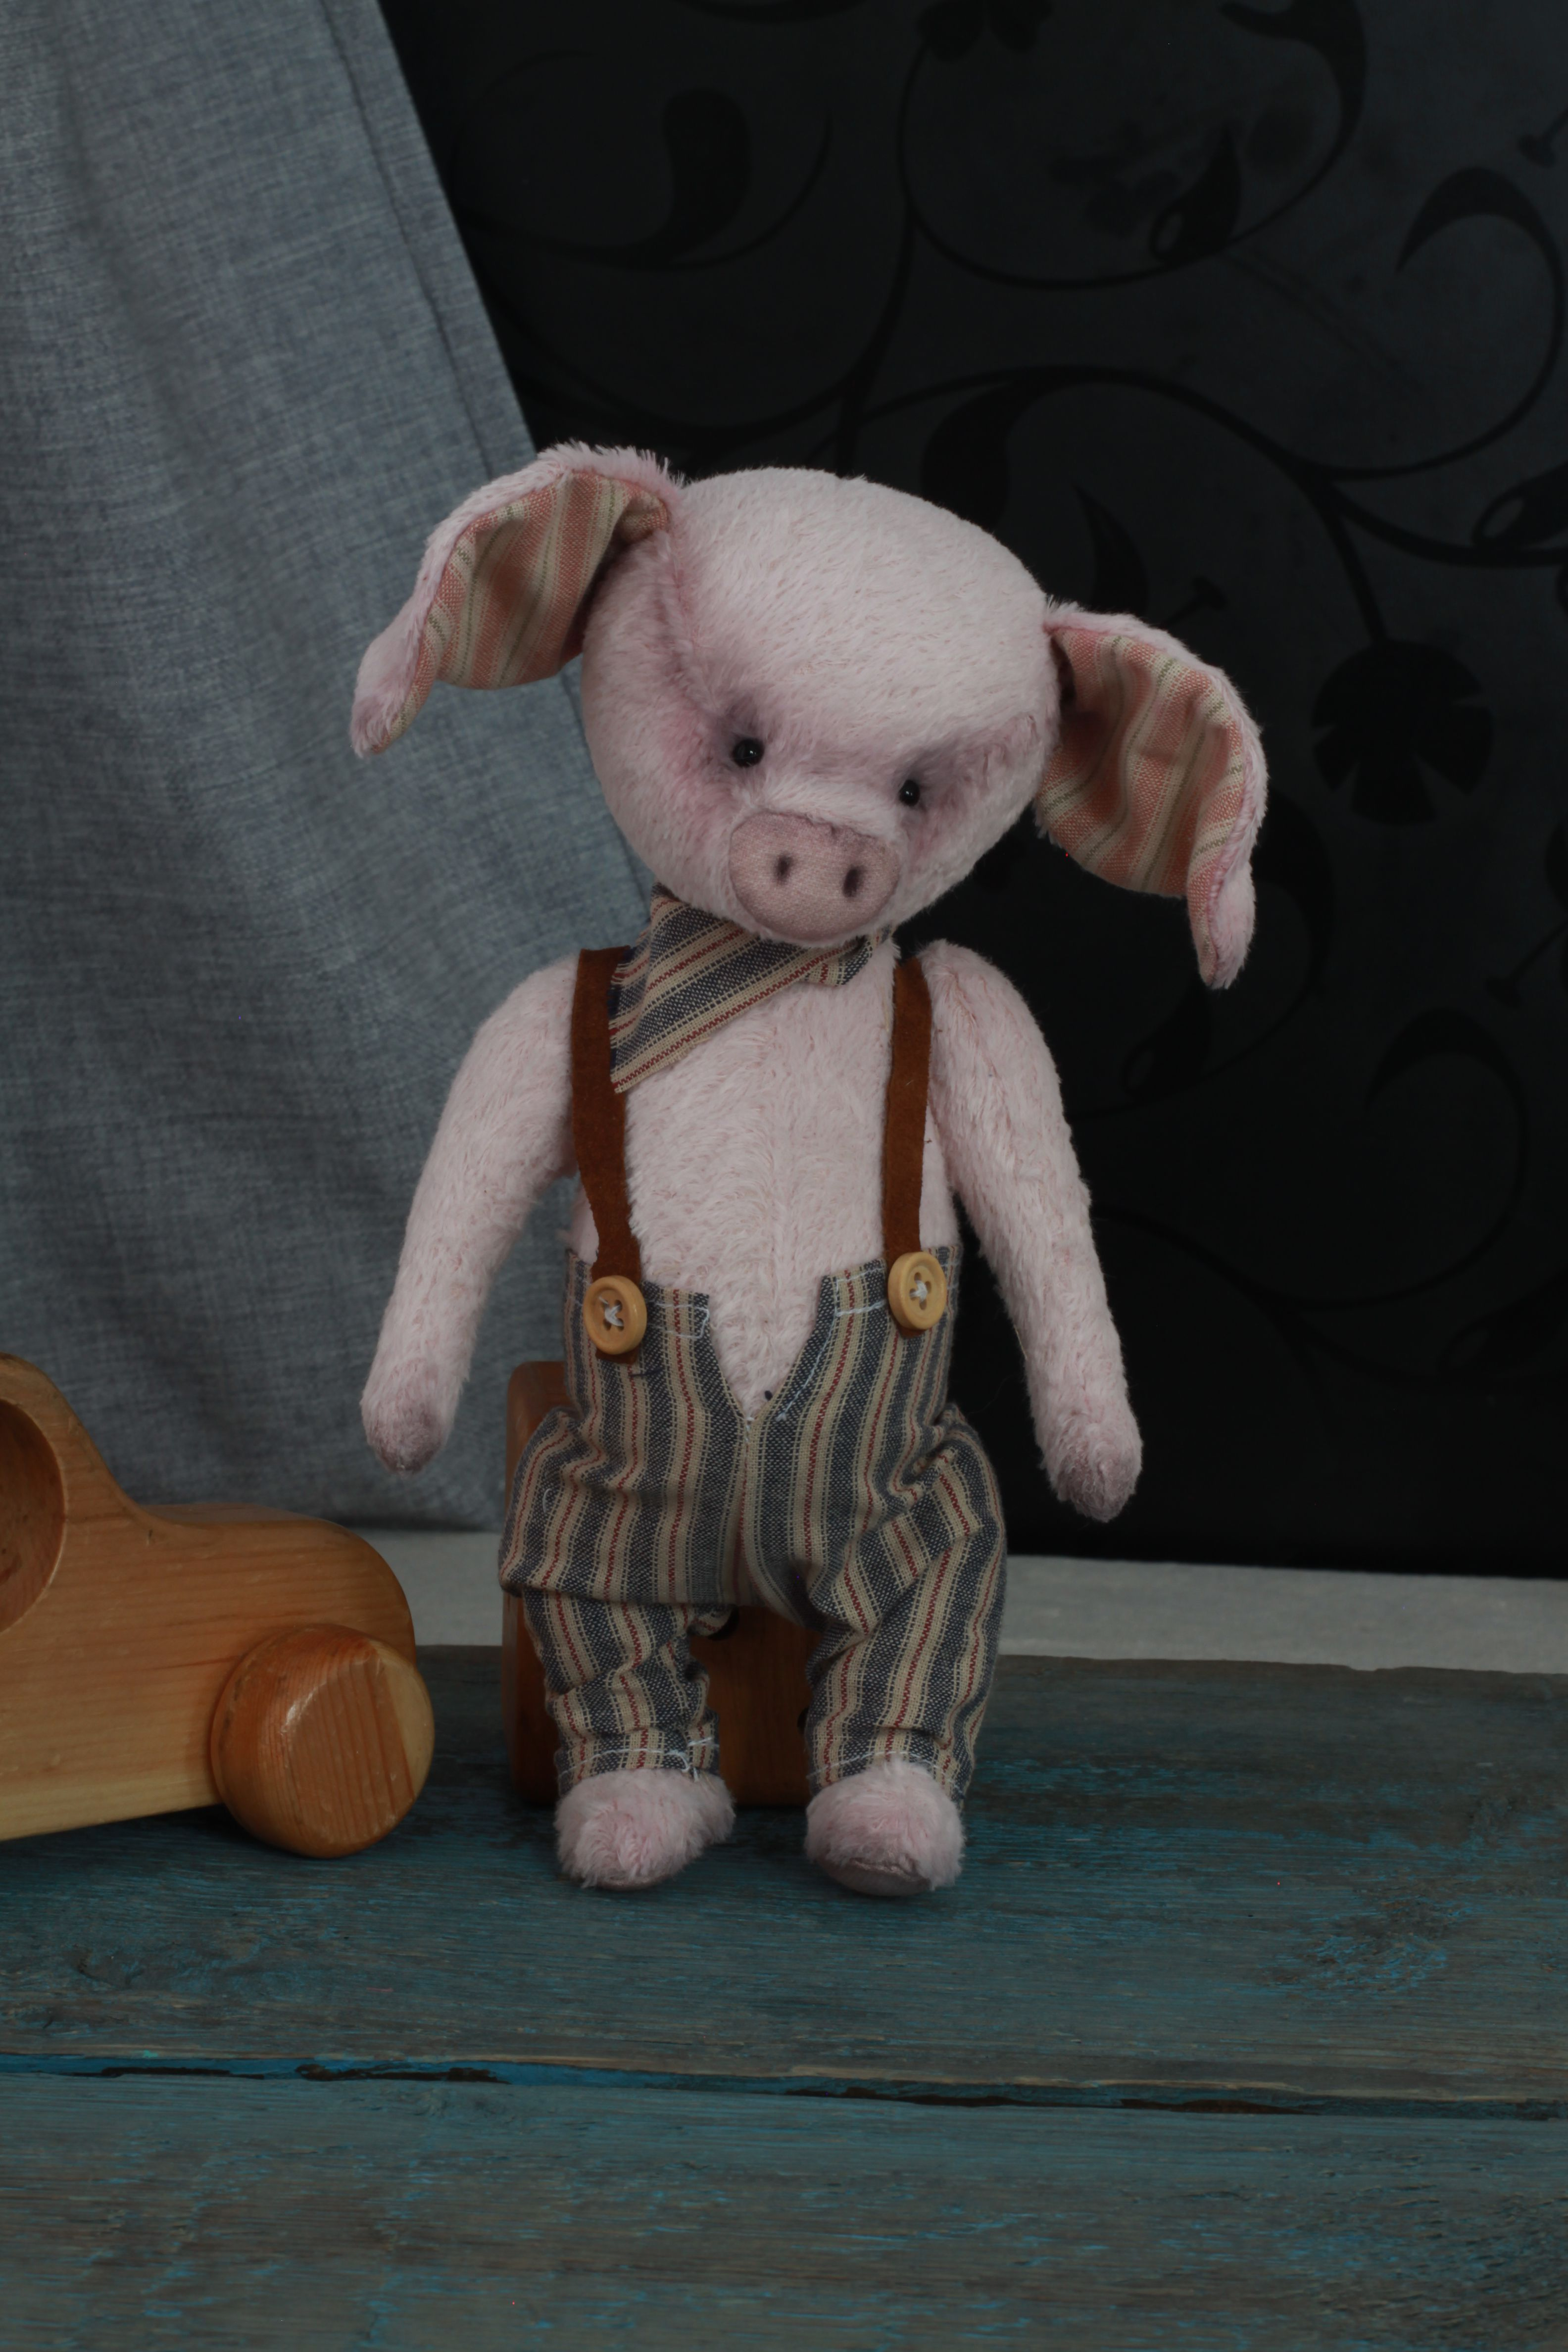 игрушки подарок поросята свинка друзьятедди